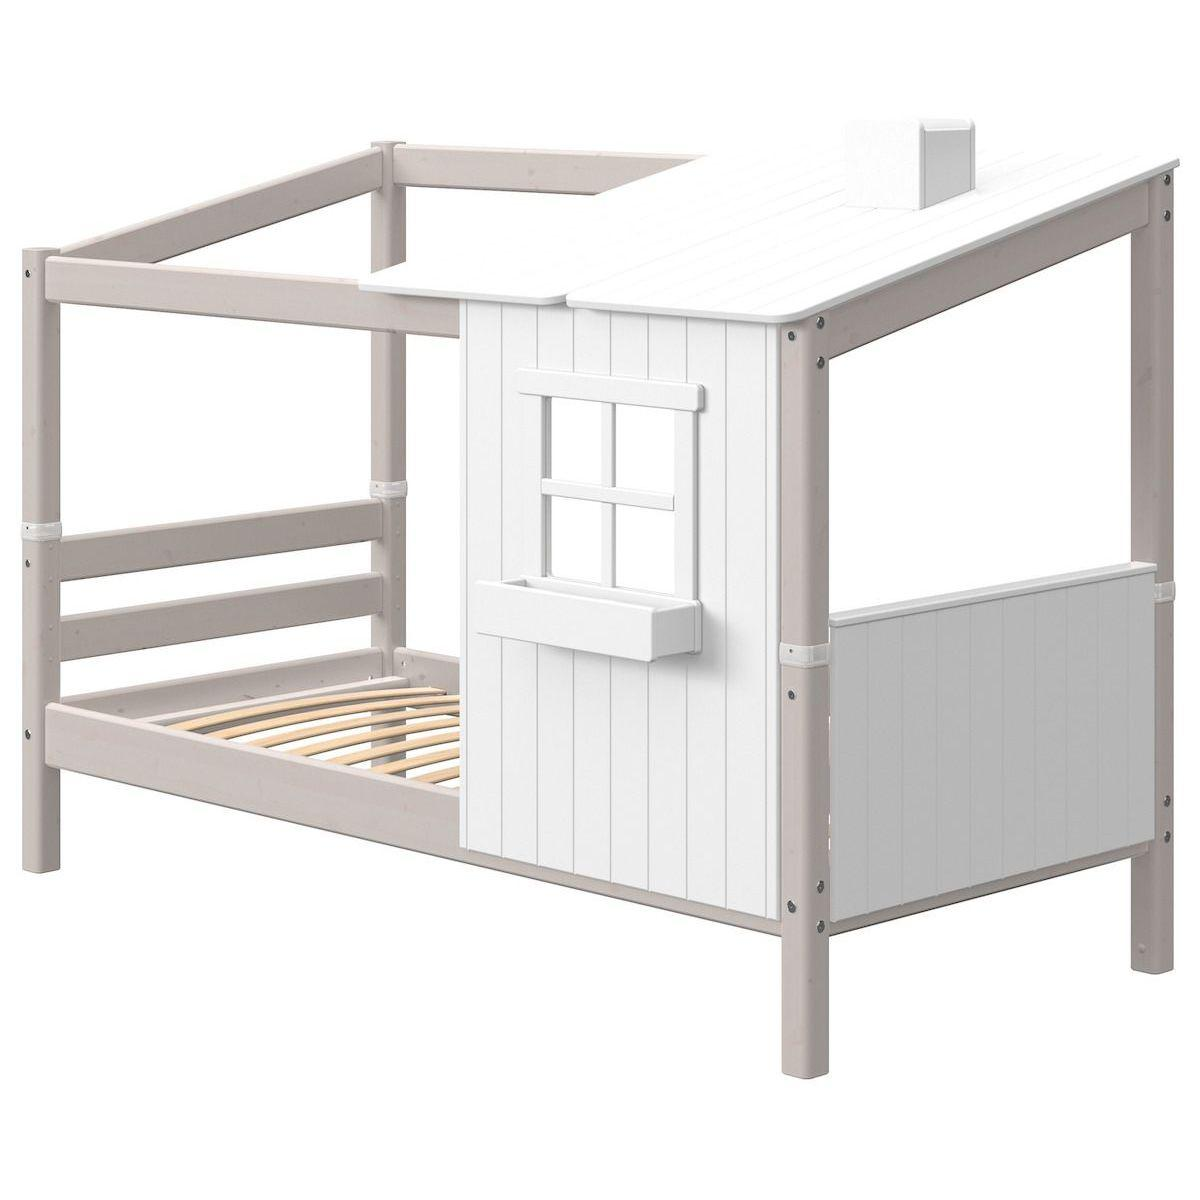 Lit bas évolutif cabane 90x200cm PLAY HOUSE CLASSIC Flexa blanc-grey washed